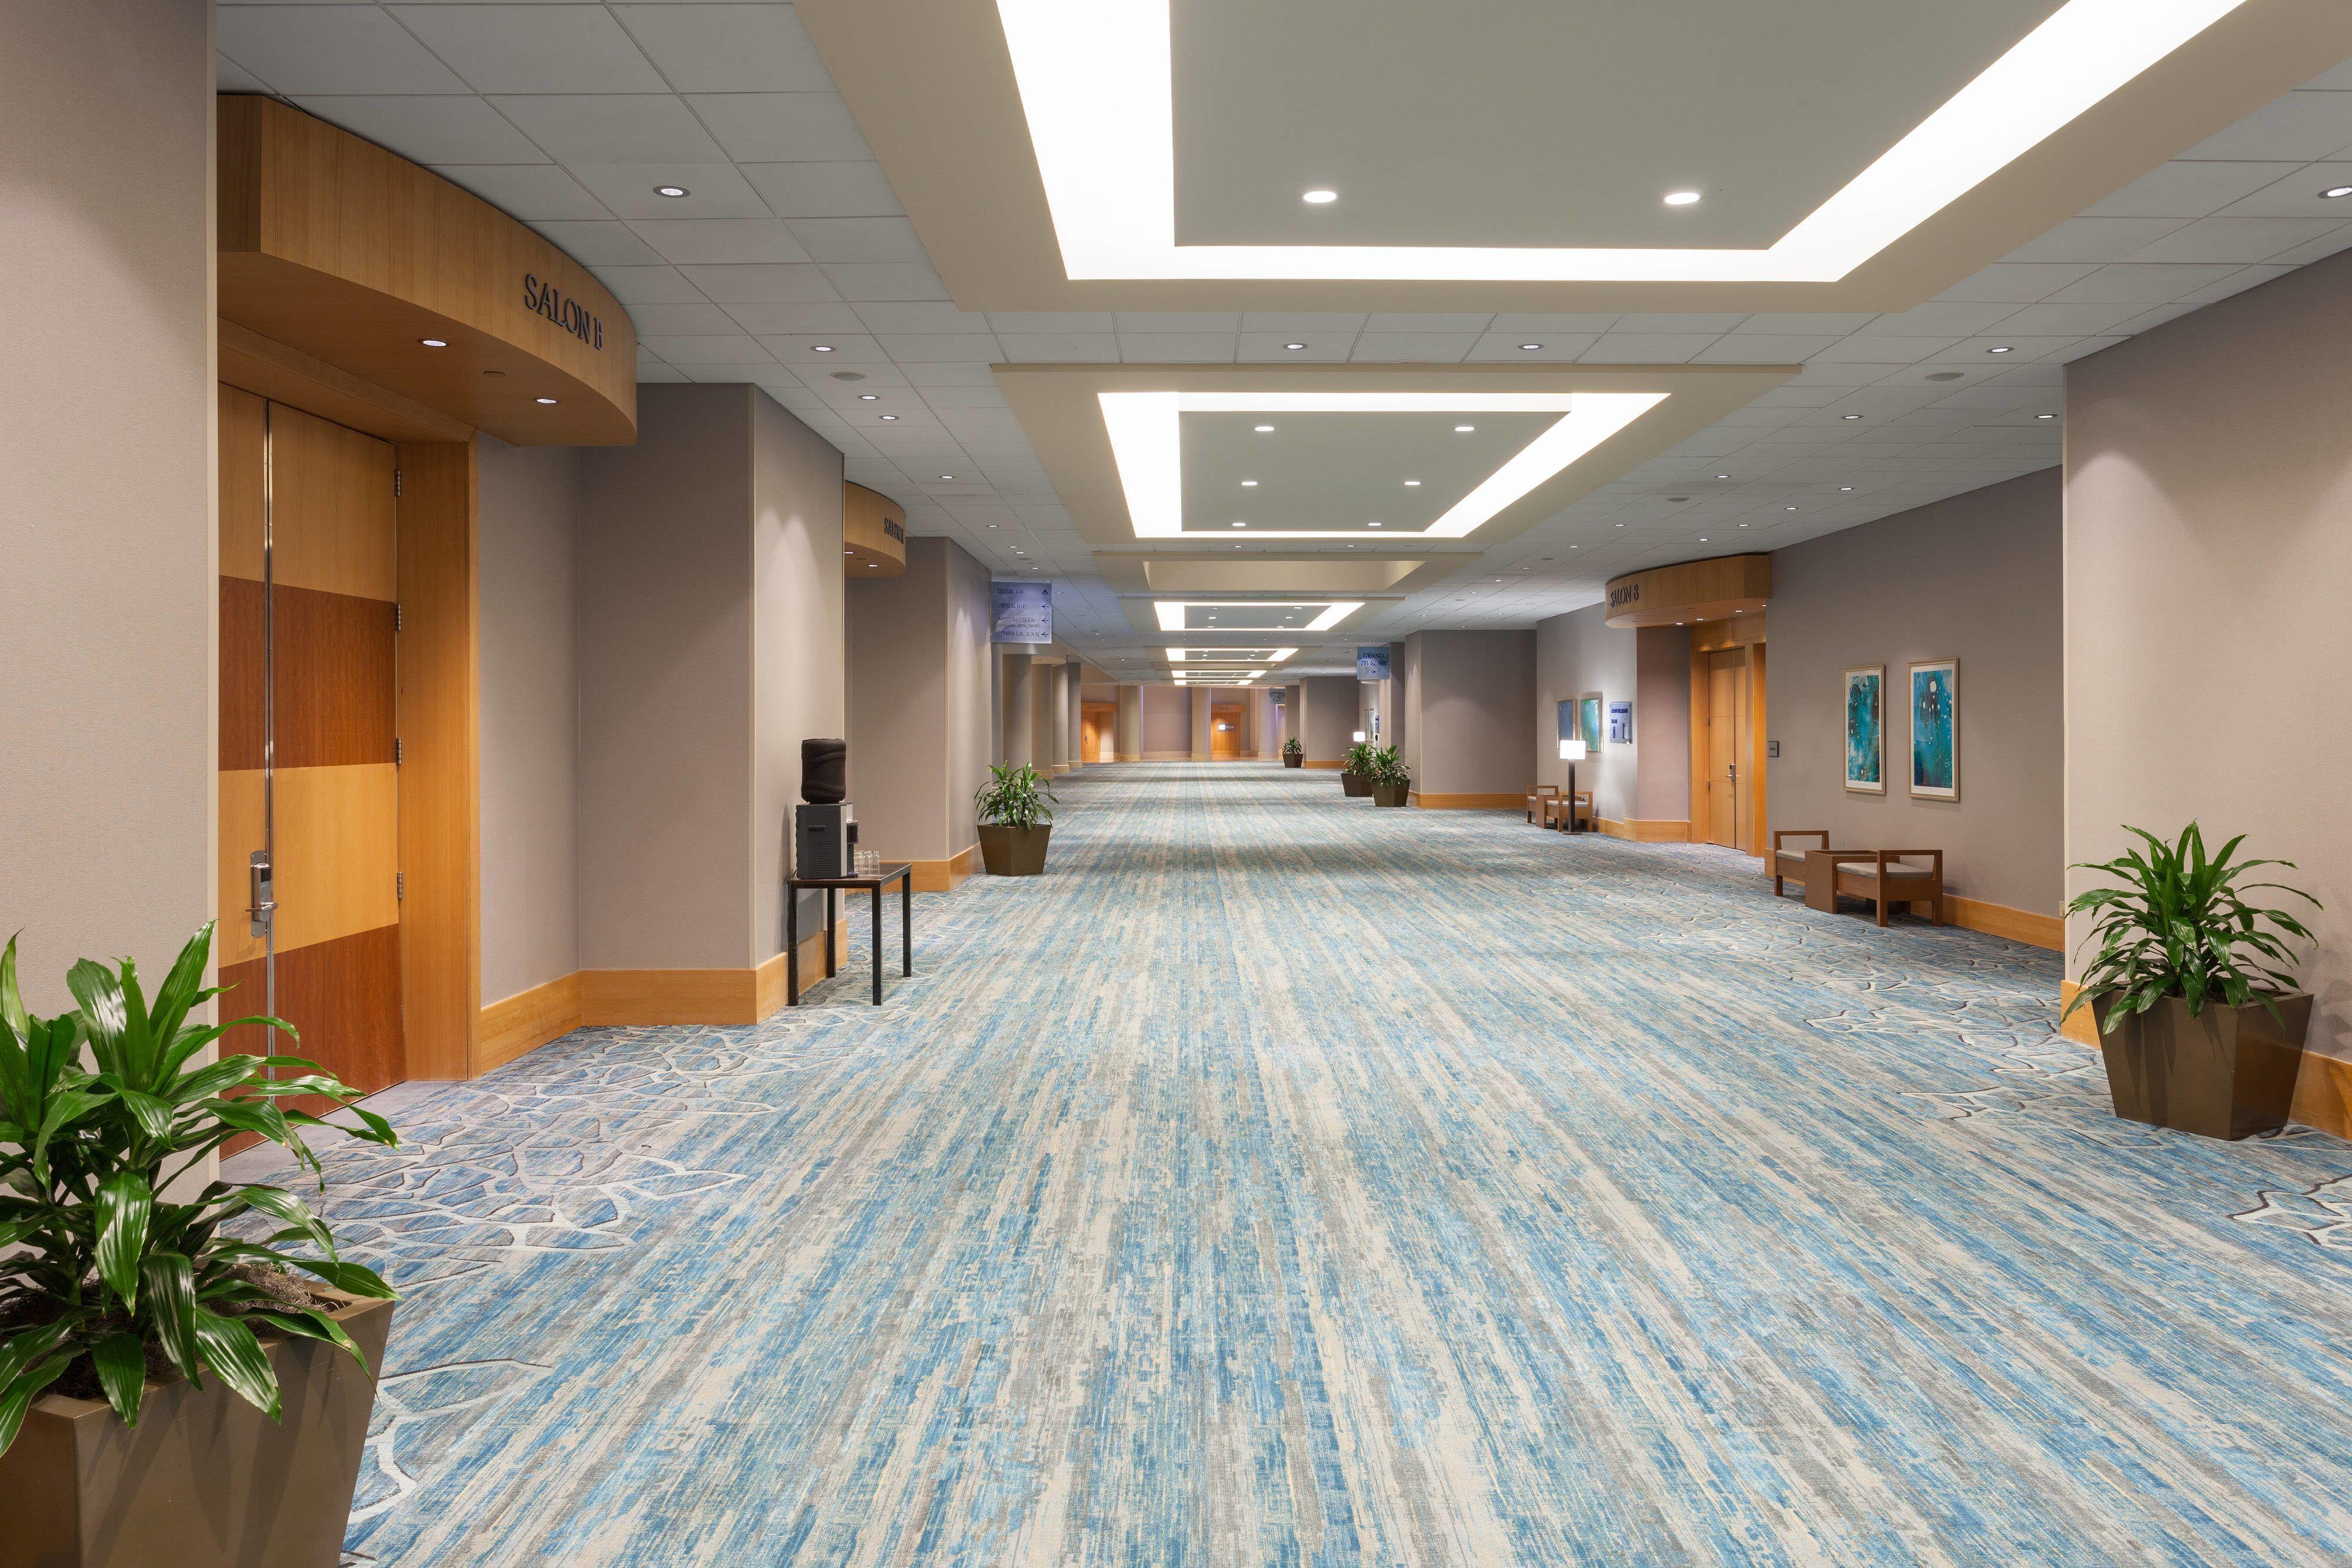 Orlando World Center Marriott Grand Ballroom Pre Function Area